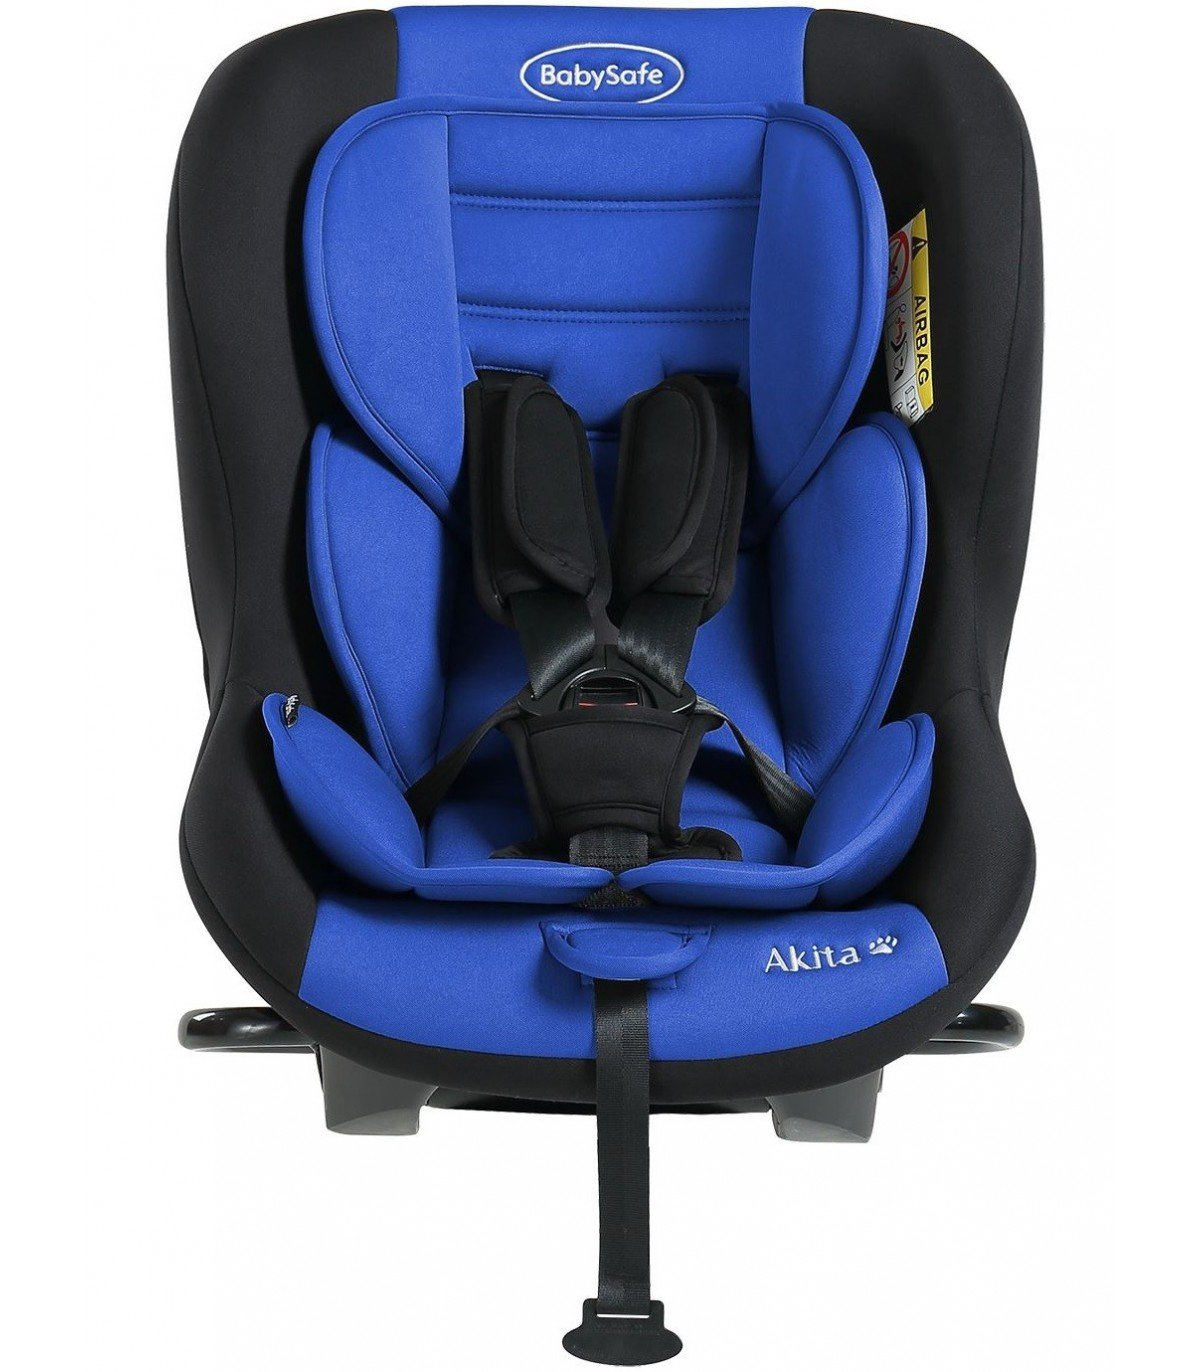 Babysafe Akita Blue Bērnu autosēdeklis 0-18 kg